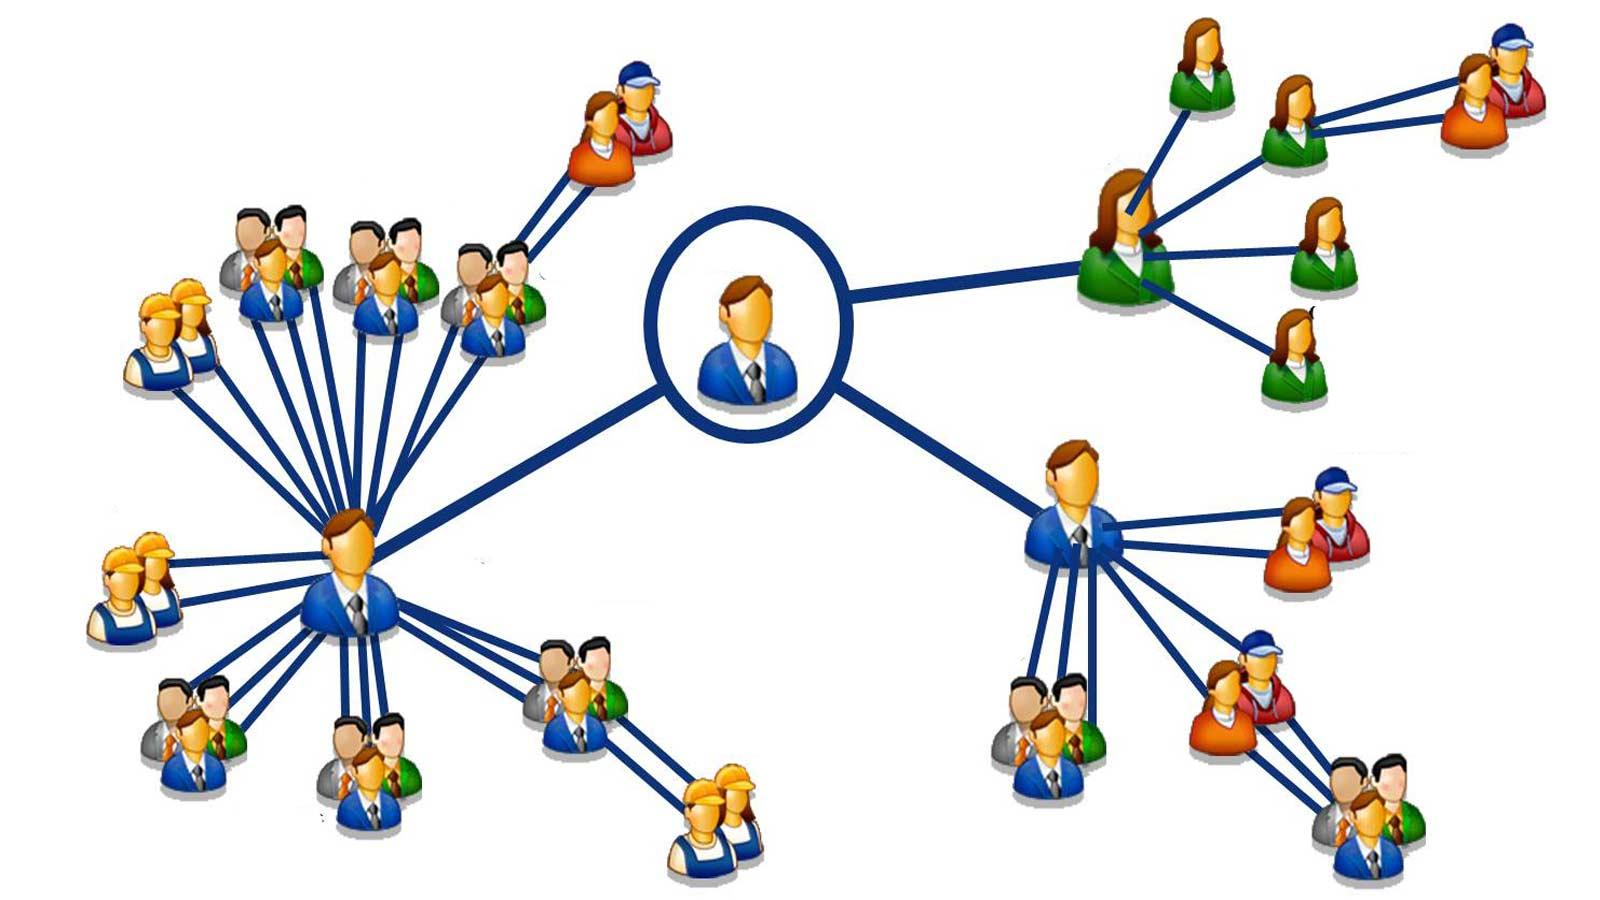 network marketing بازاریابی شبکهای نتورک مارکتینگ بازاریابی چند سطحی Multi-level marketing